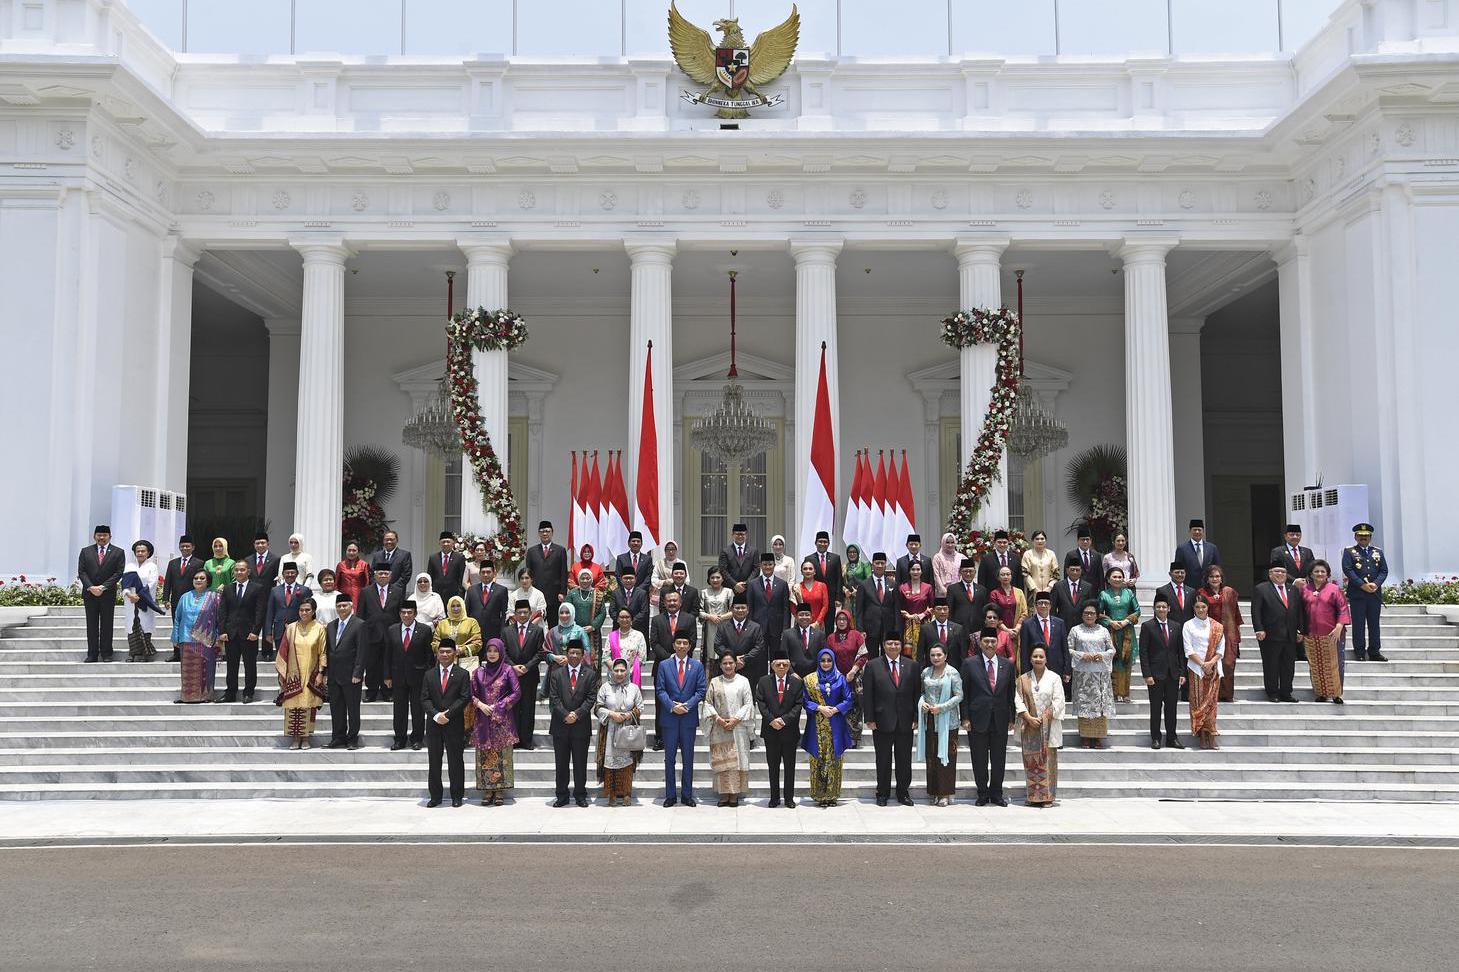 jokowi, ma'ruf amin, kabinet indonesia maju